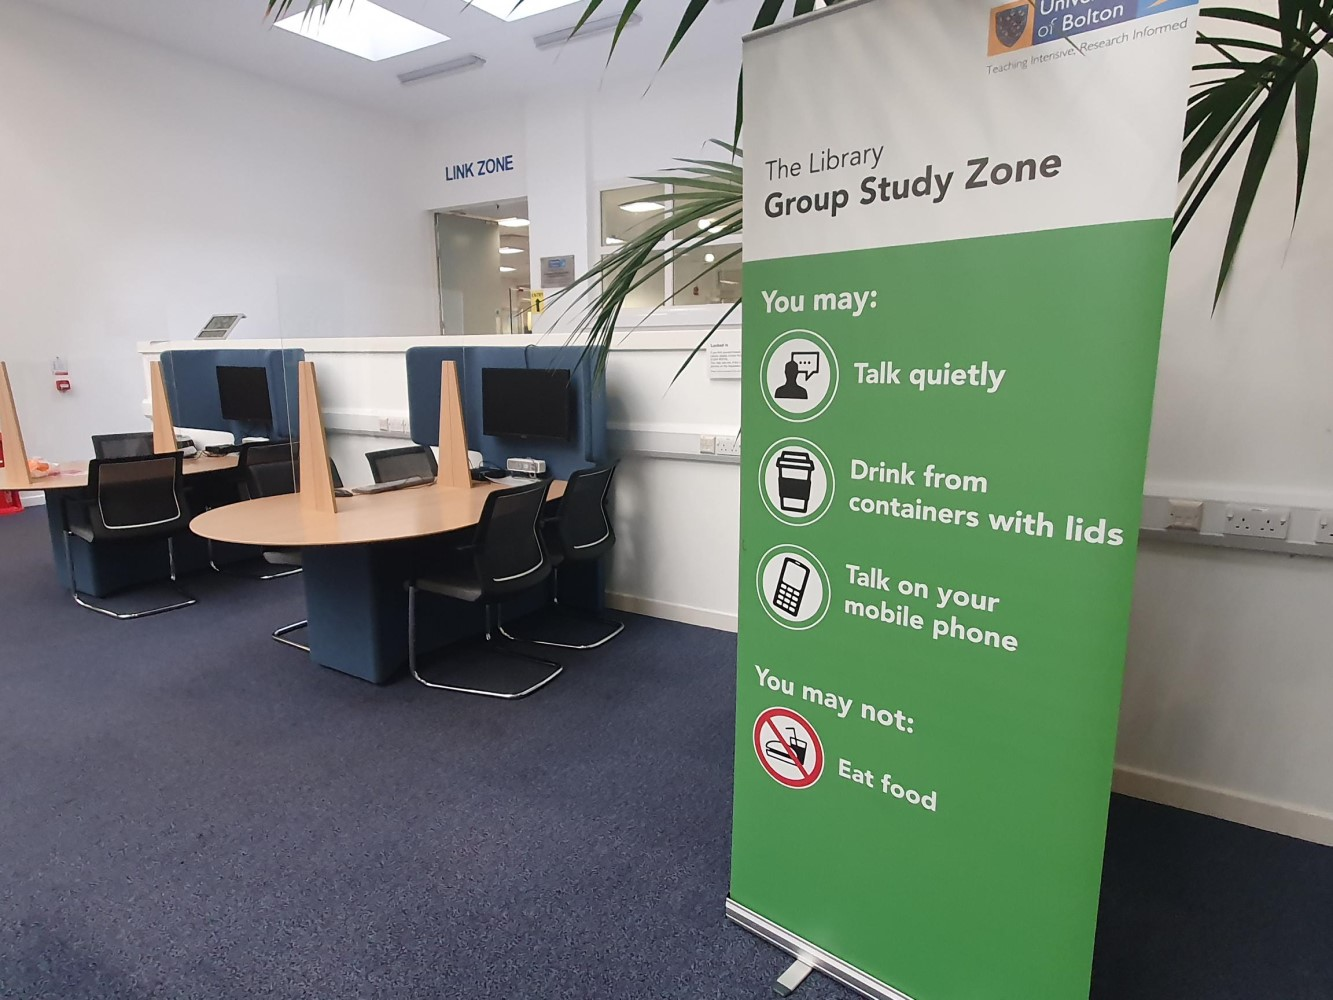 Group Study Zone